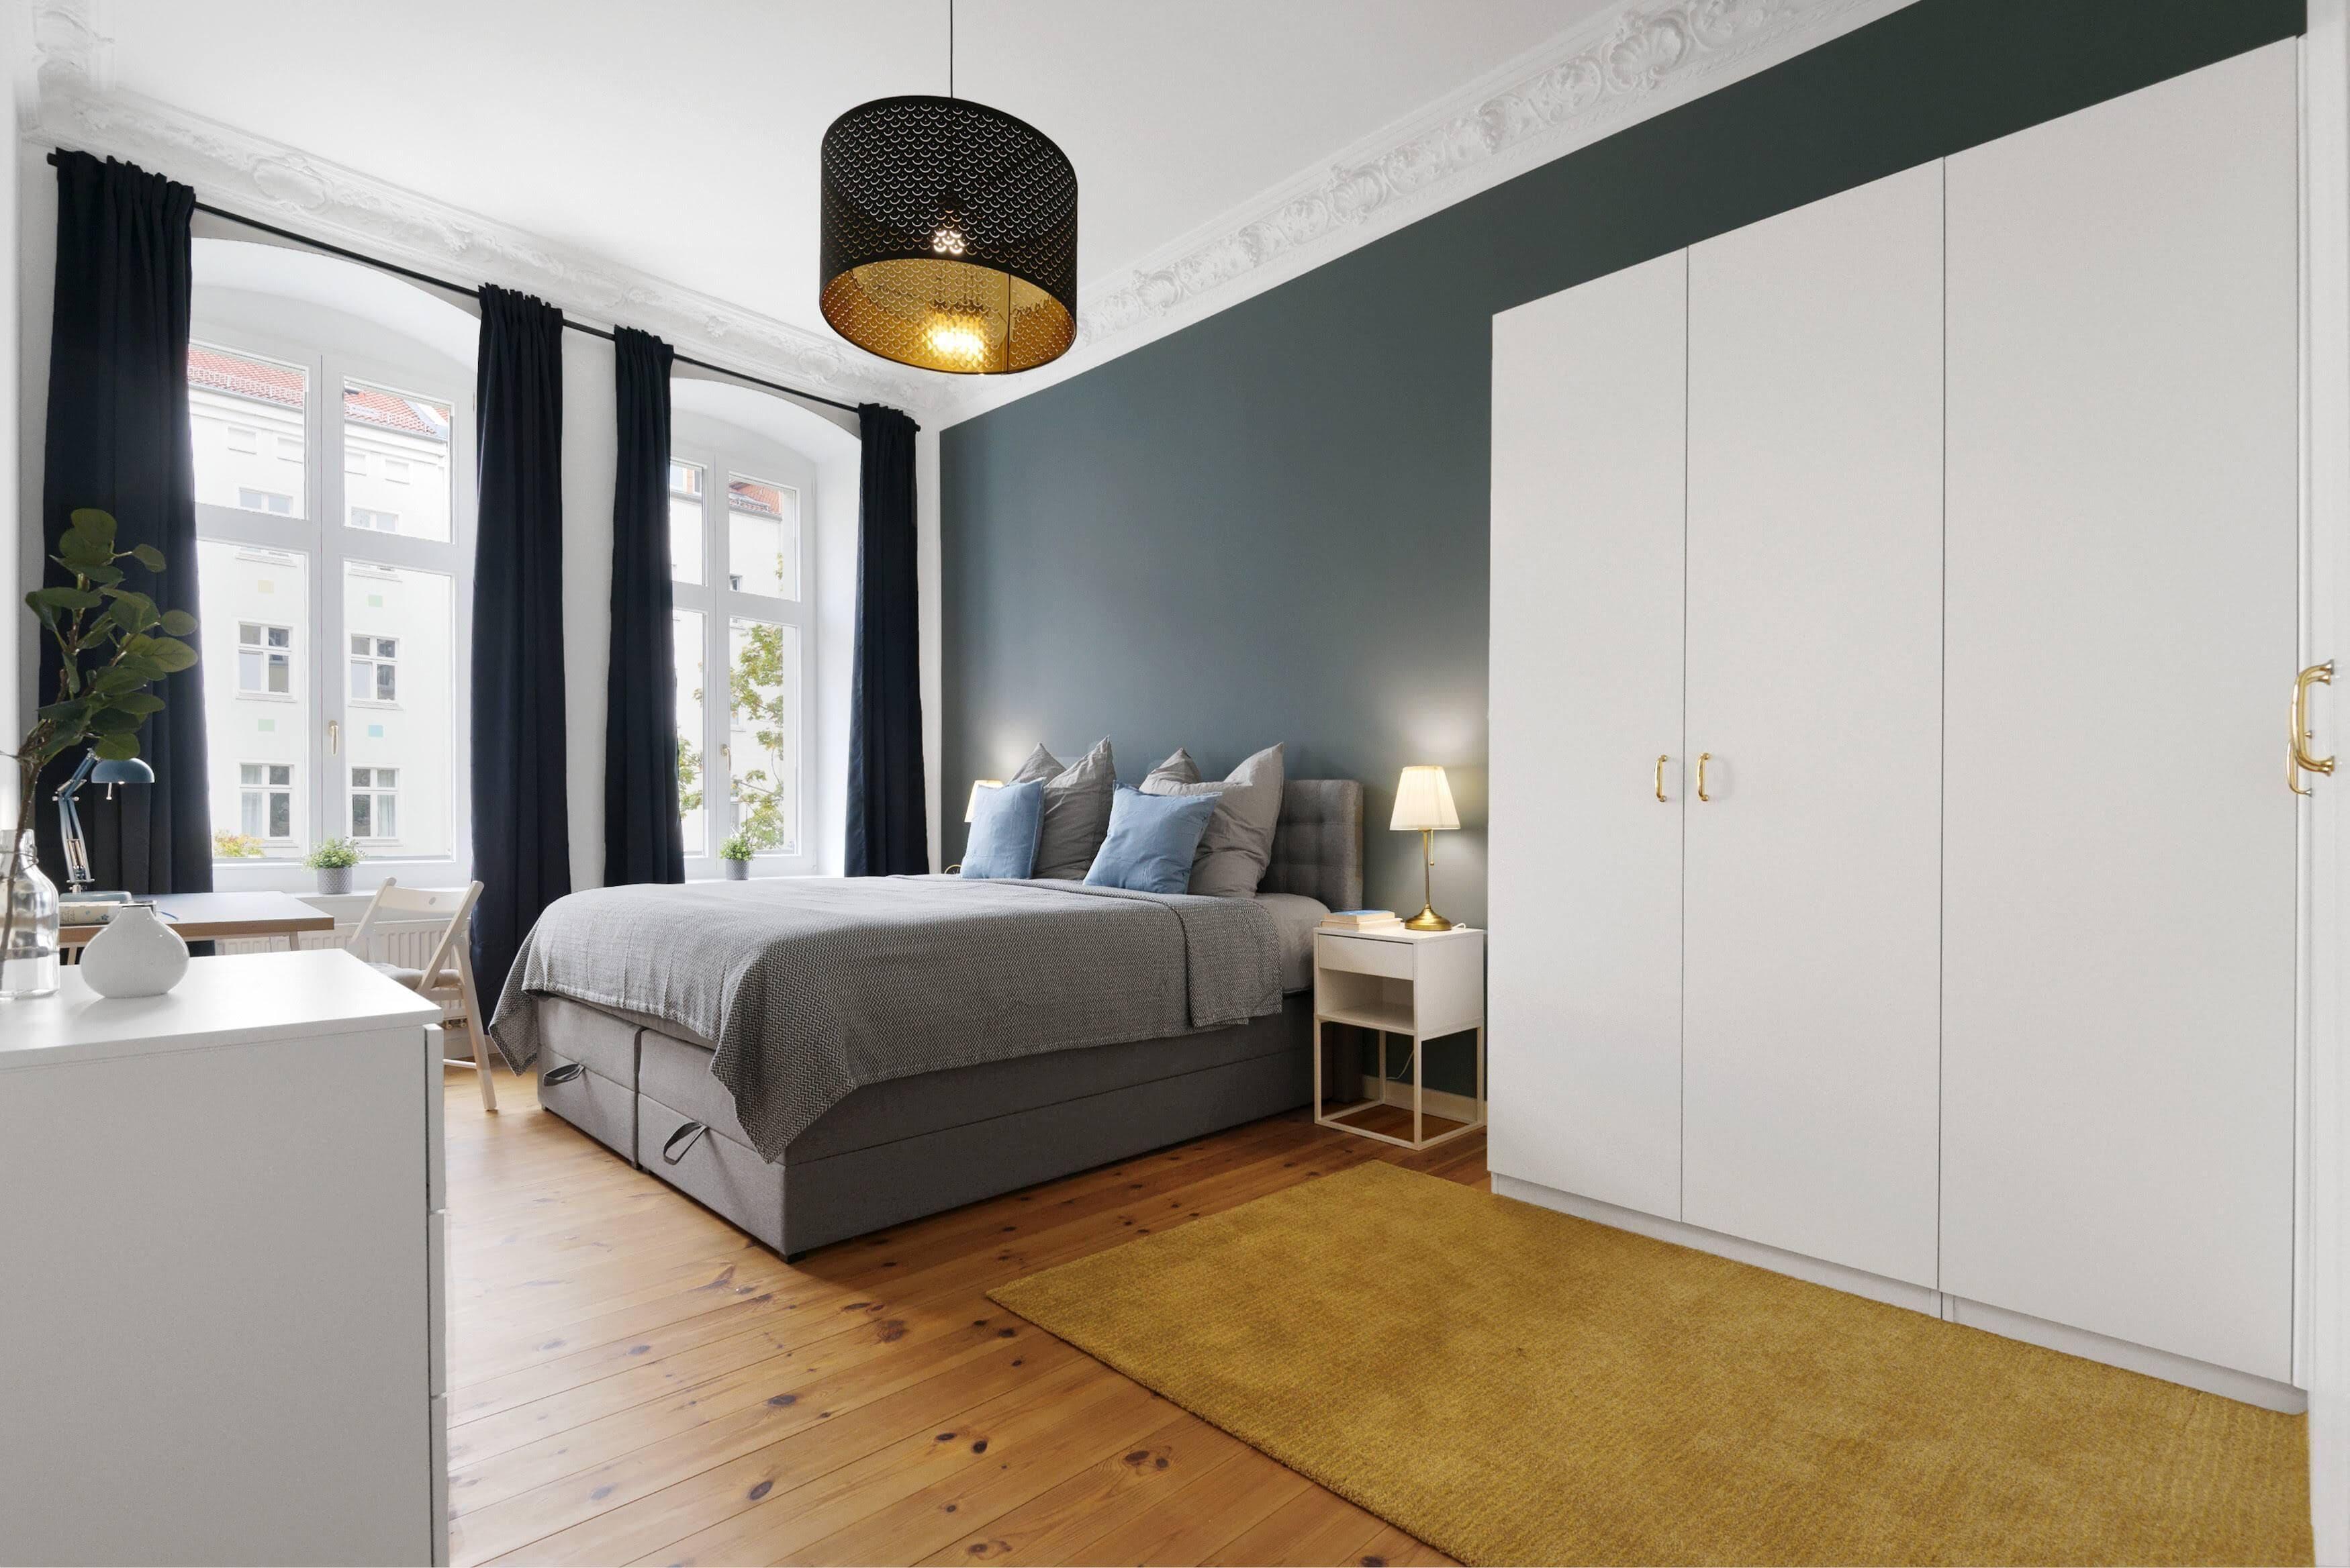 3 Room Refurbed Loft Apartment With Open Kitchen And Sunny Balcony Berlin Hotelbewertungen 2020 Expedia De